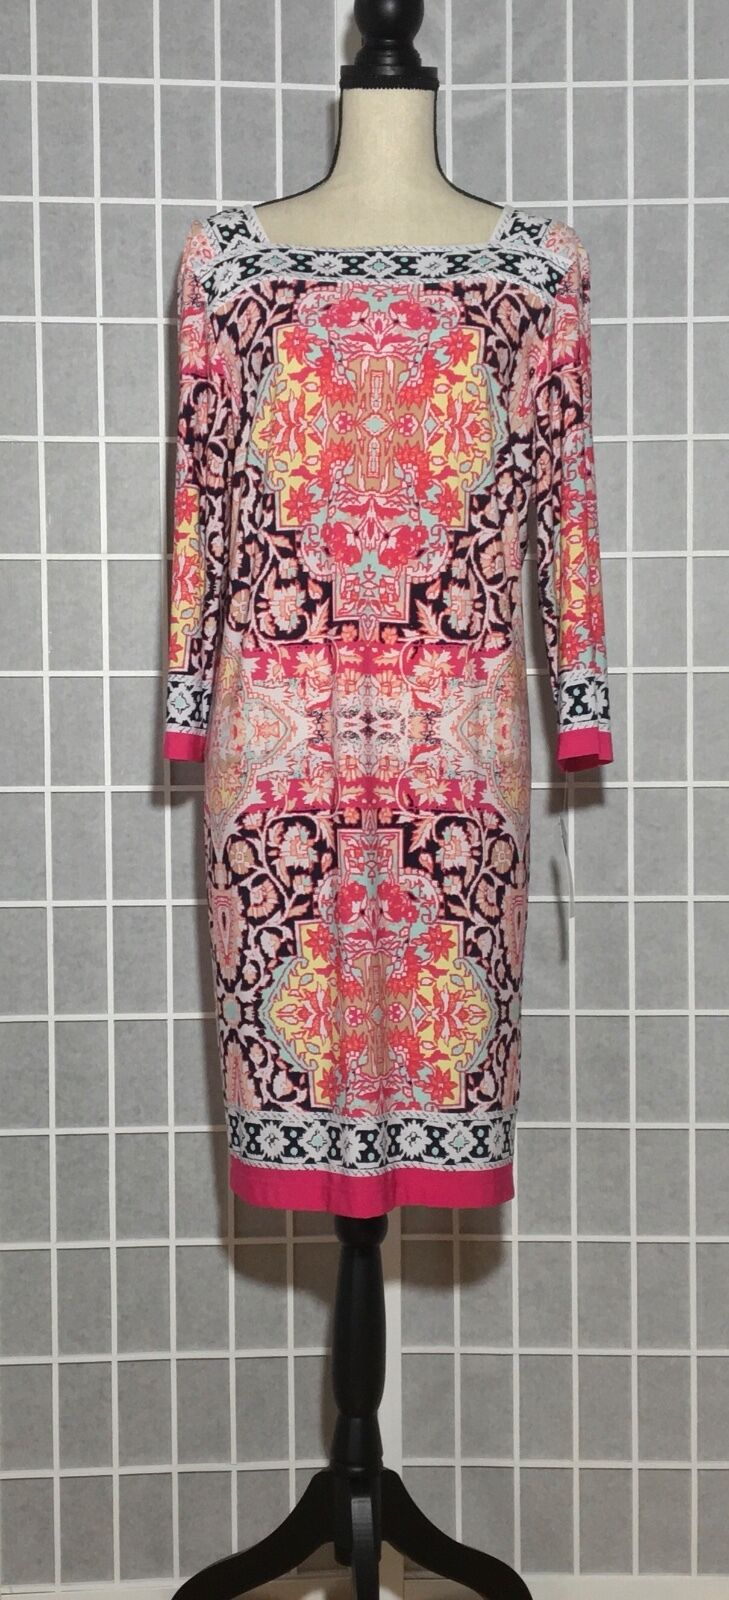 NWT Sandra Darren Paisley Square Neck All Over Print Dress Rosa Multi Sz16